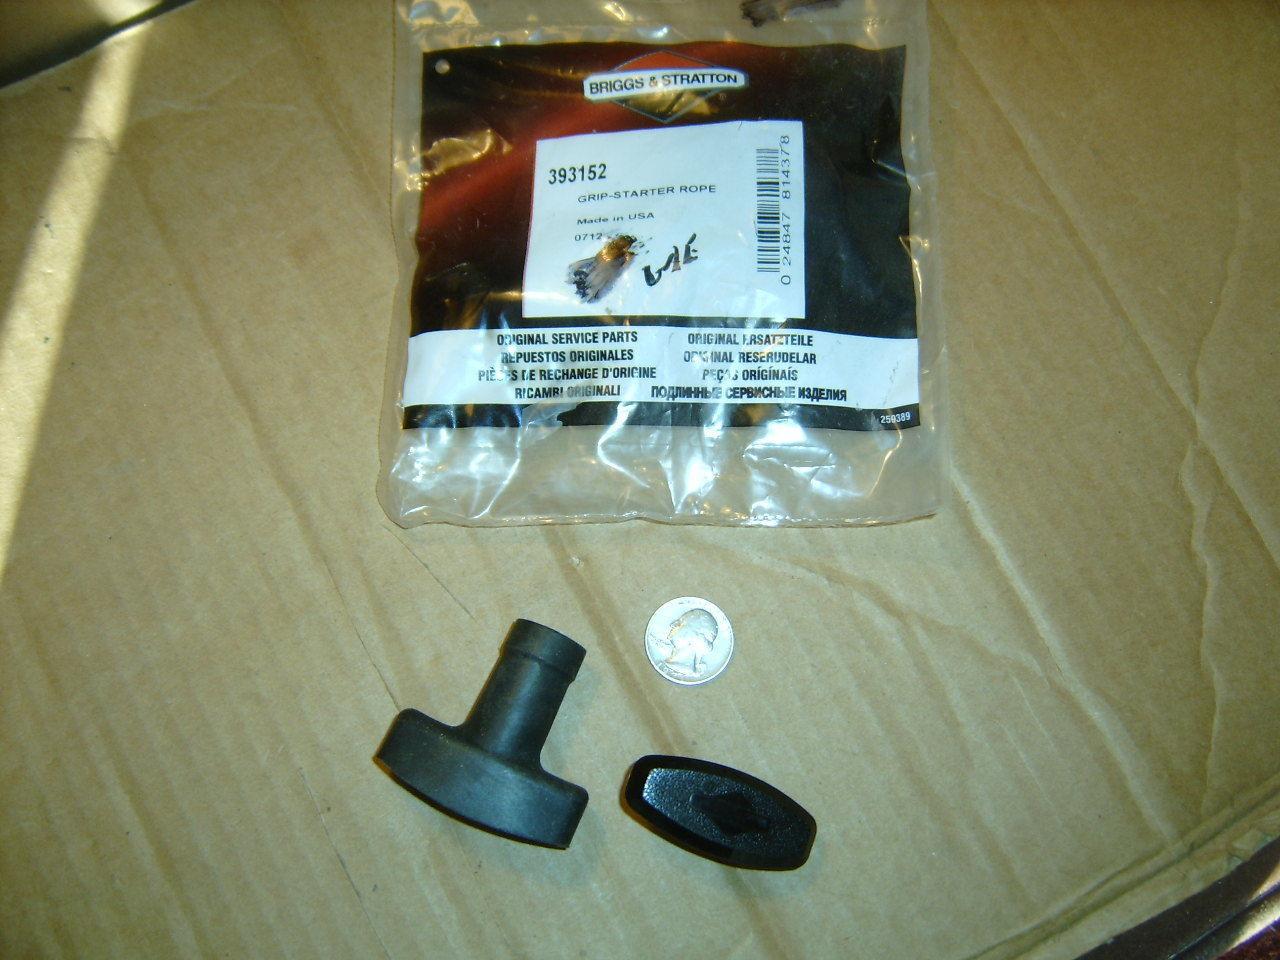 Genuine OEM Briggs & Stratton Starter Pull Handle Assy. Pt # 393152 *NEW* B8